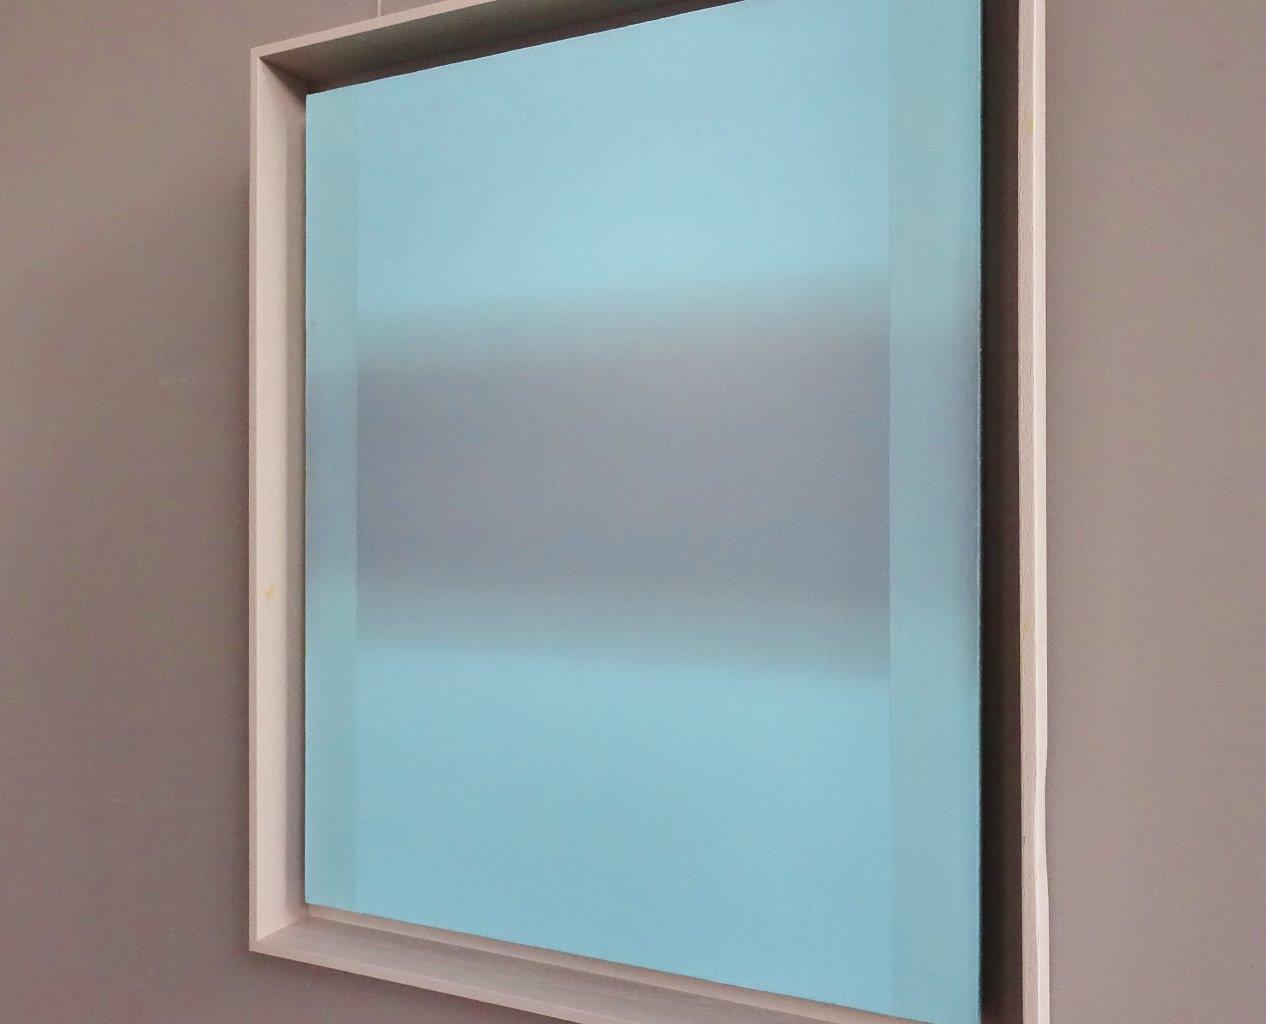 Anna Podlewska : Ultra light blue